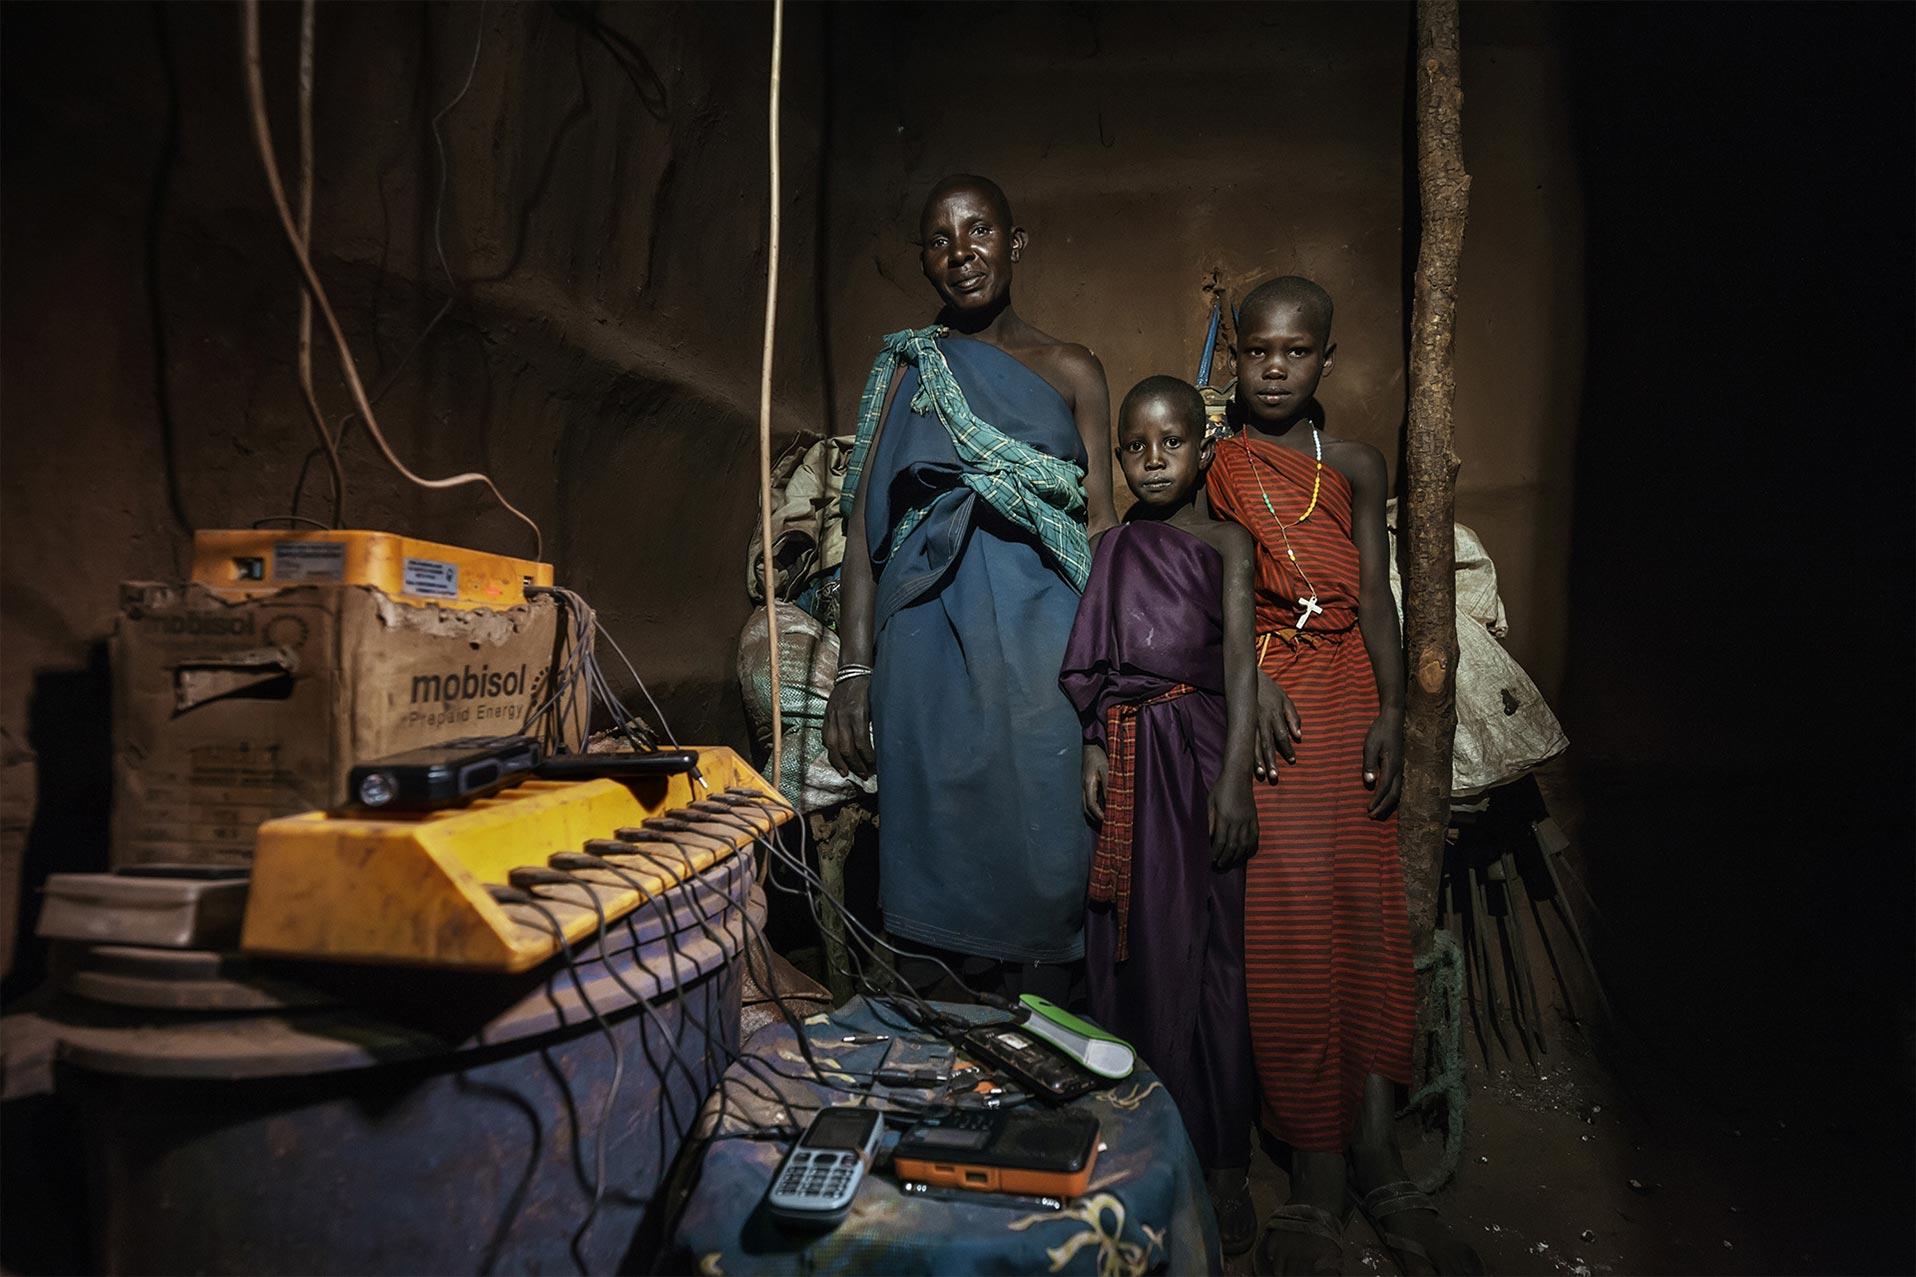 Cellulari in carica in una casa africana. Energy portraits - Reportage del fotografo Marco Garofalo